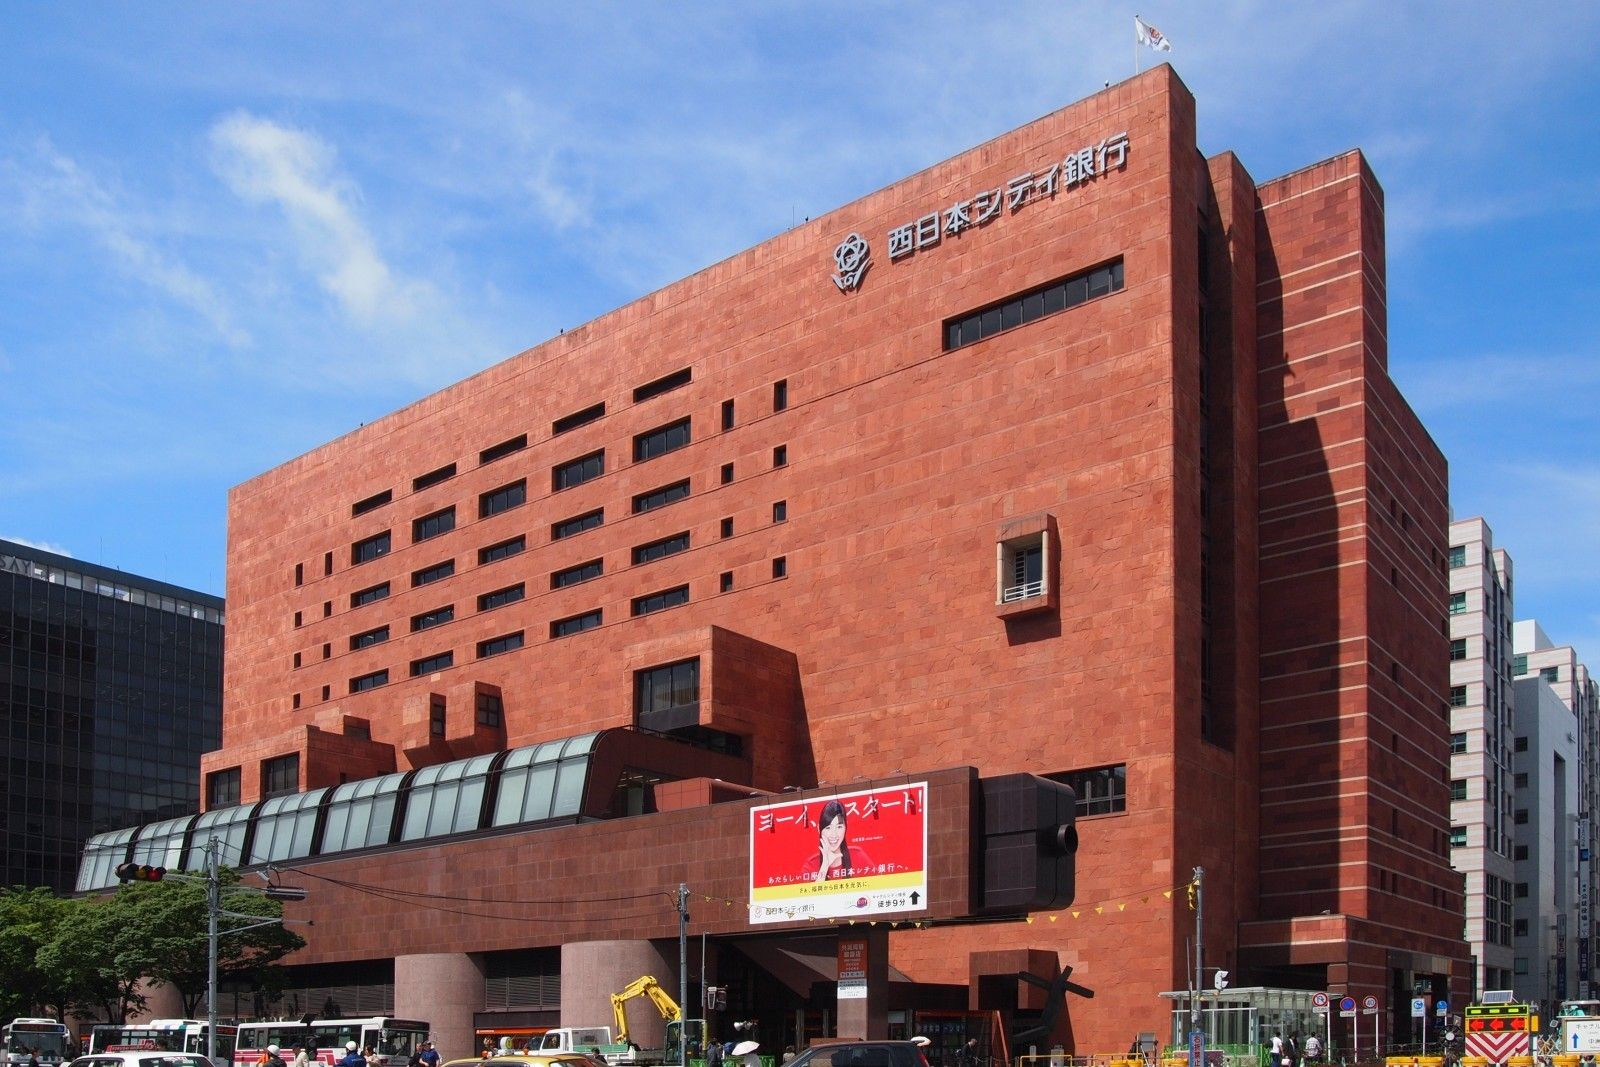 Nishinihon City Bank Arata Isozaki 1971 Famous Architects Arata Isozaki Architecture